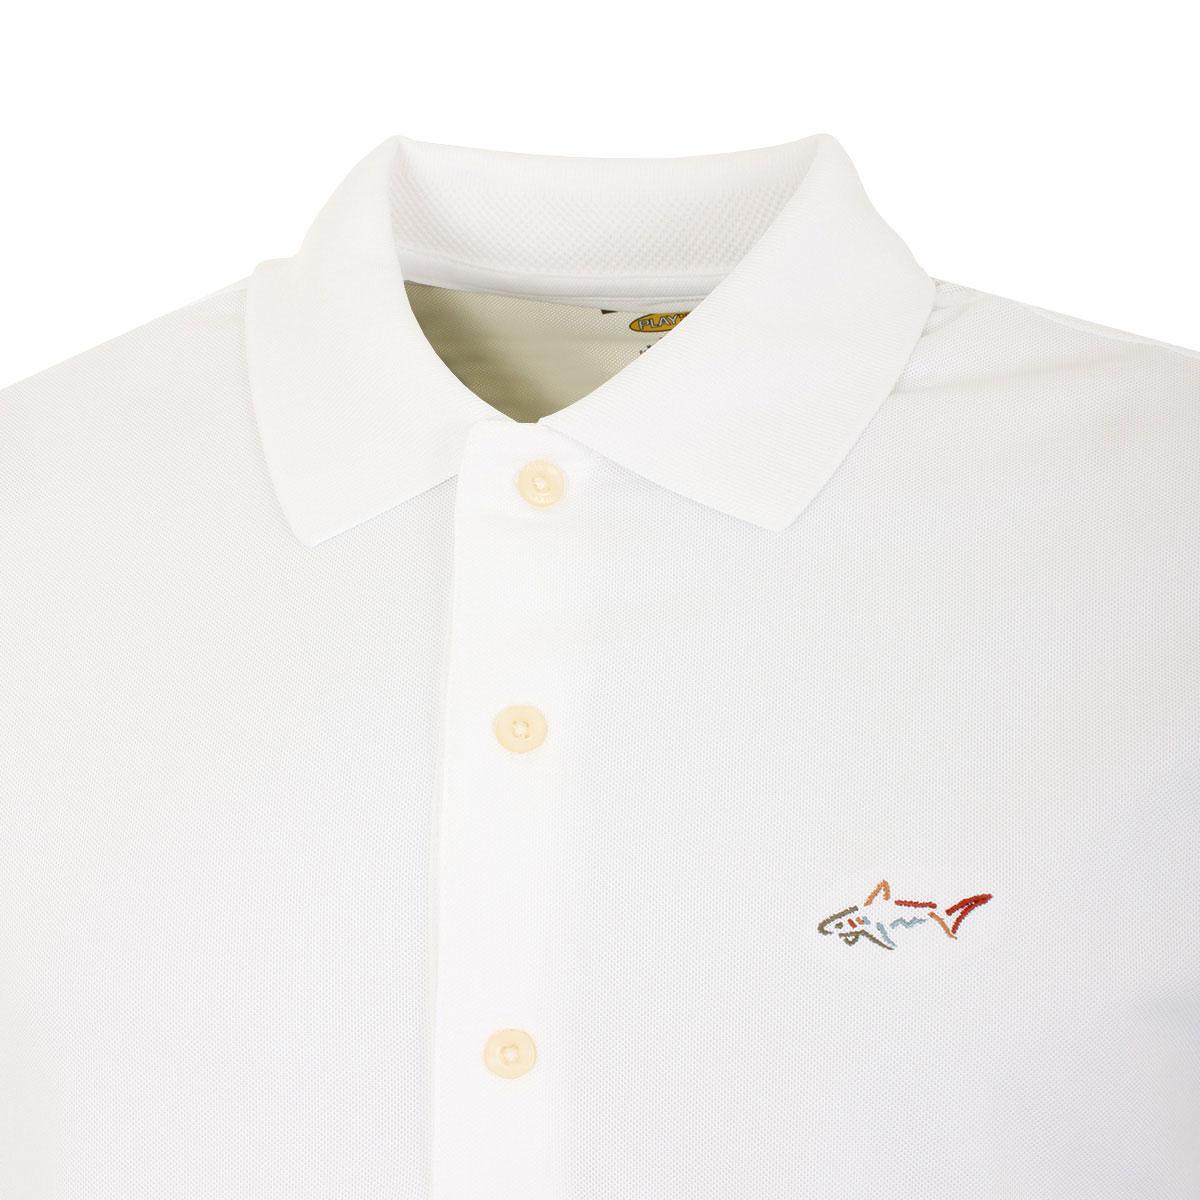 Greg-Norman-Mens-KX04-Performance-Micro-Pique-Golf-Polo-Shirt-28-OFF-RRP thumbnail 81